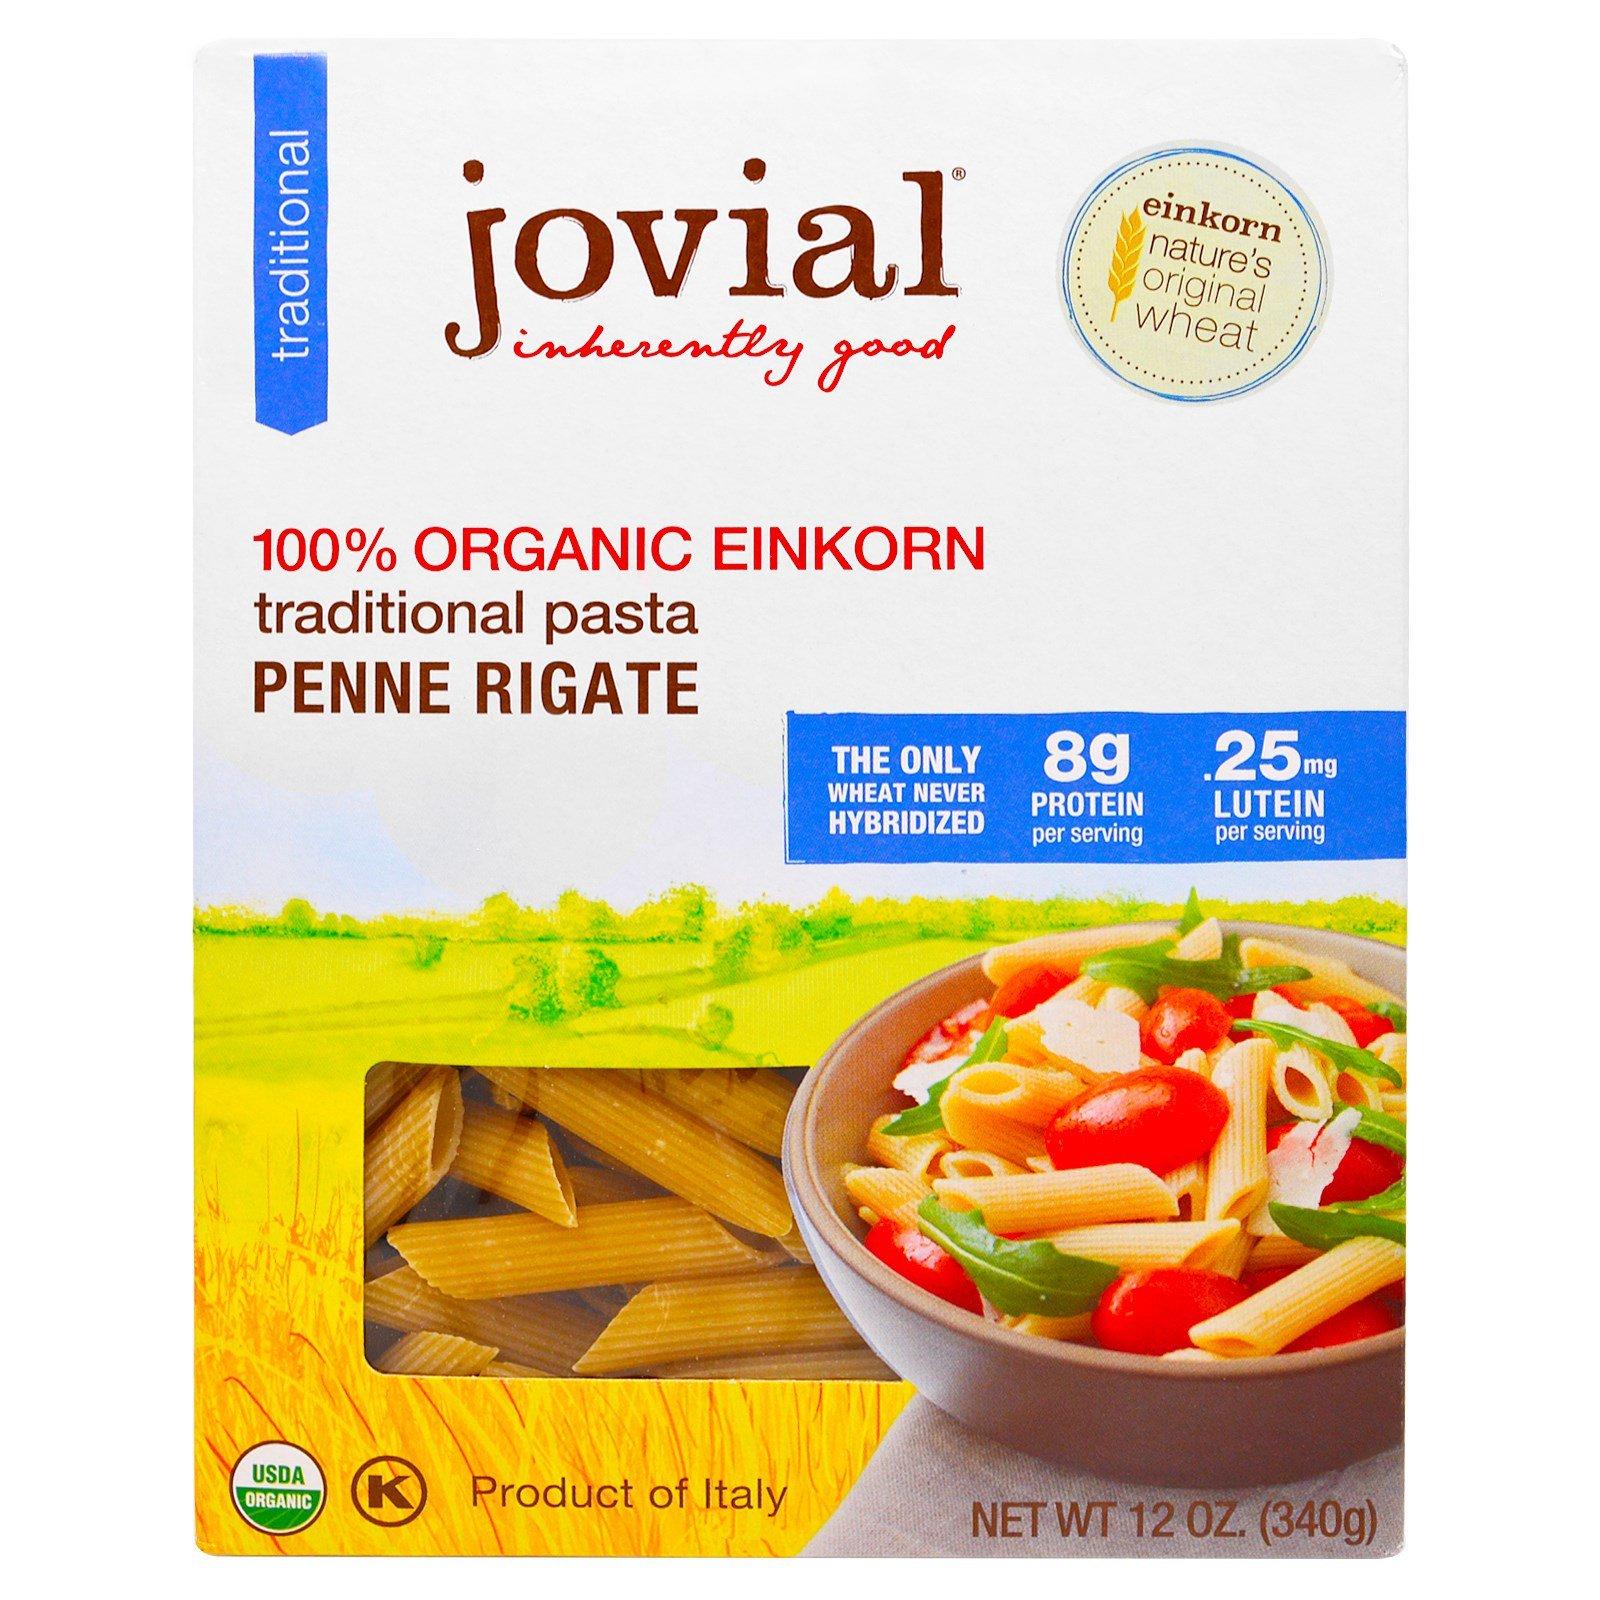 Jovial 100% Organic Einkorn Penne Rigate (6 Pack)